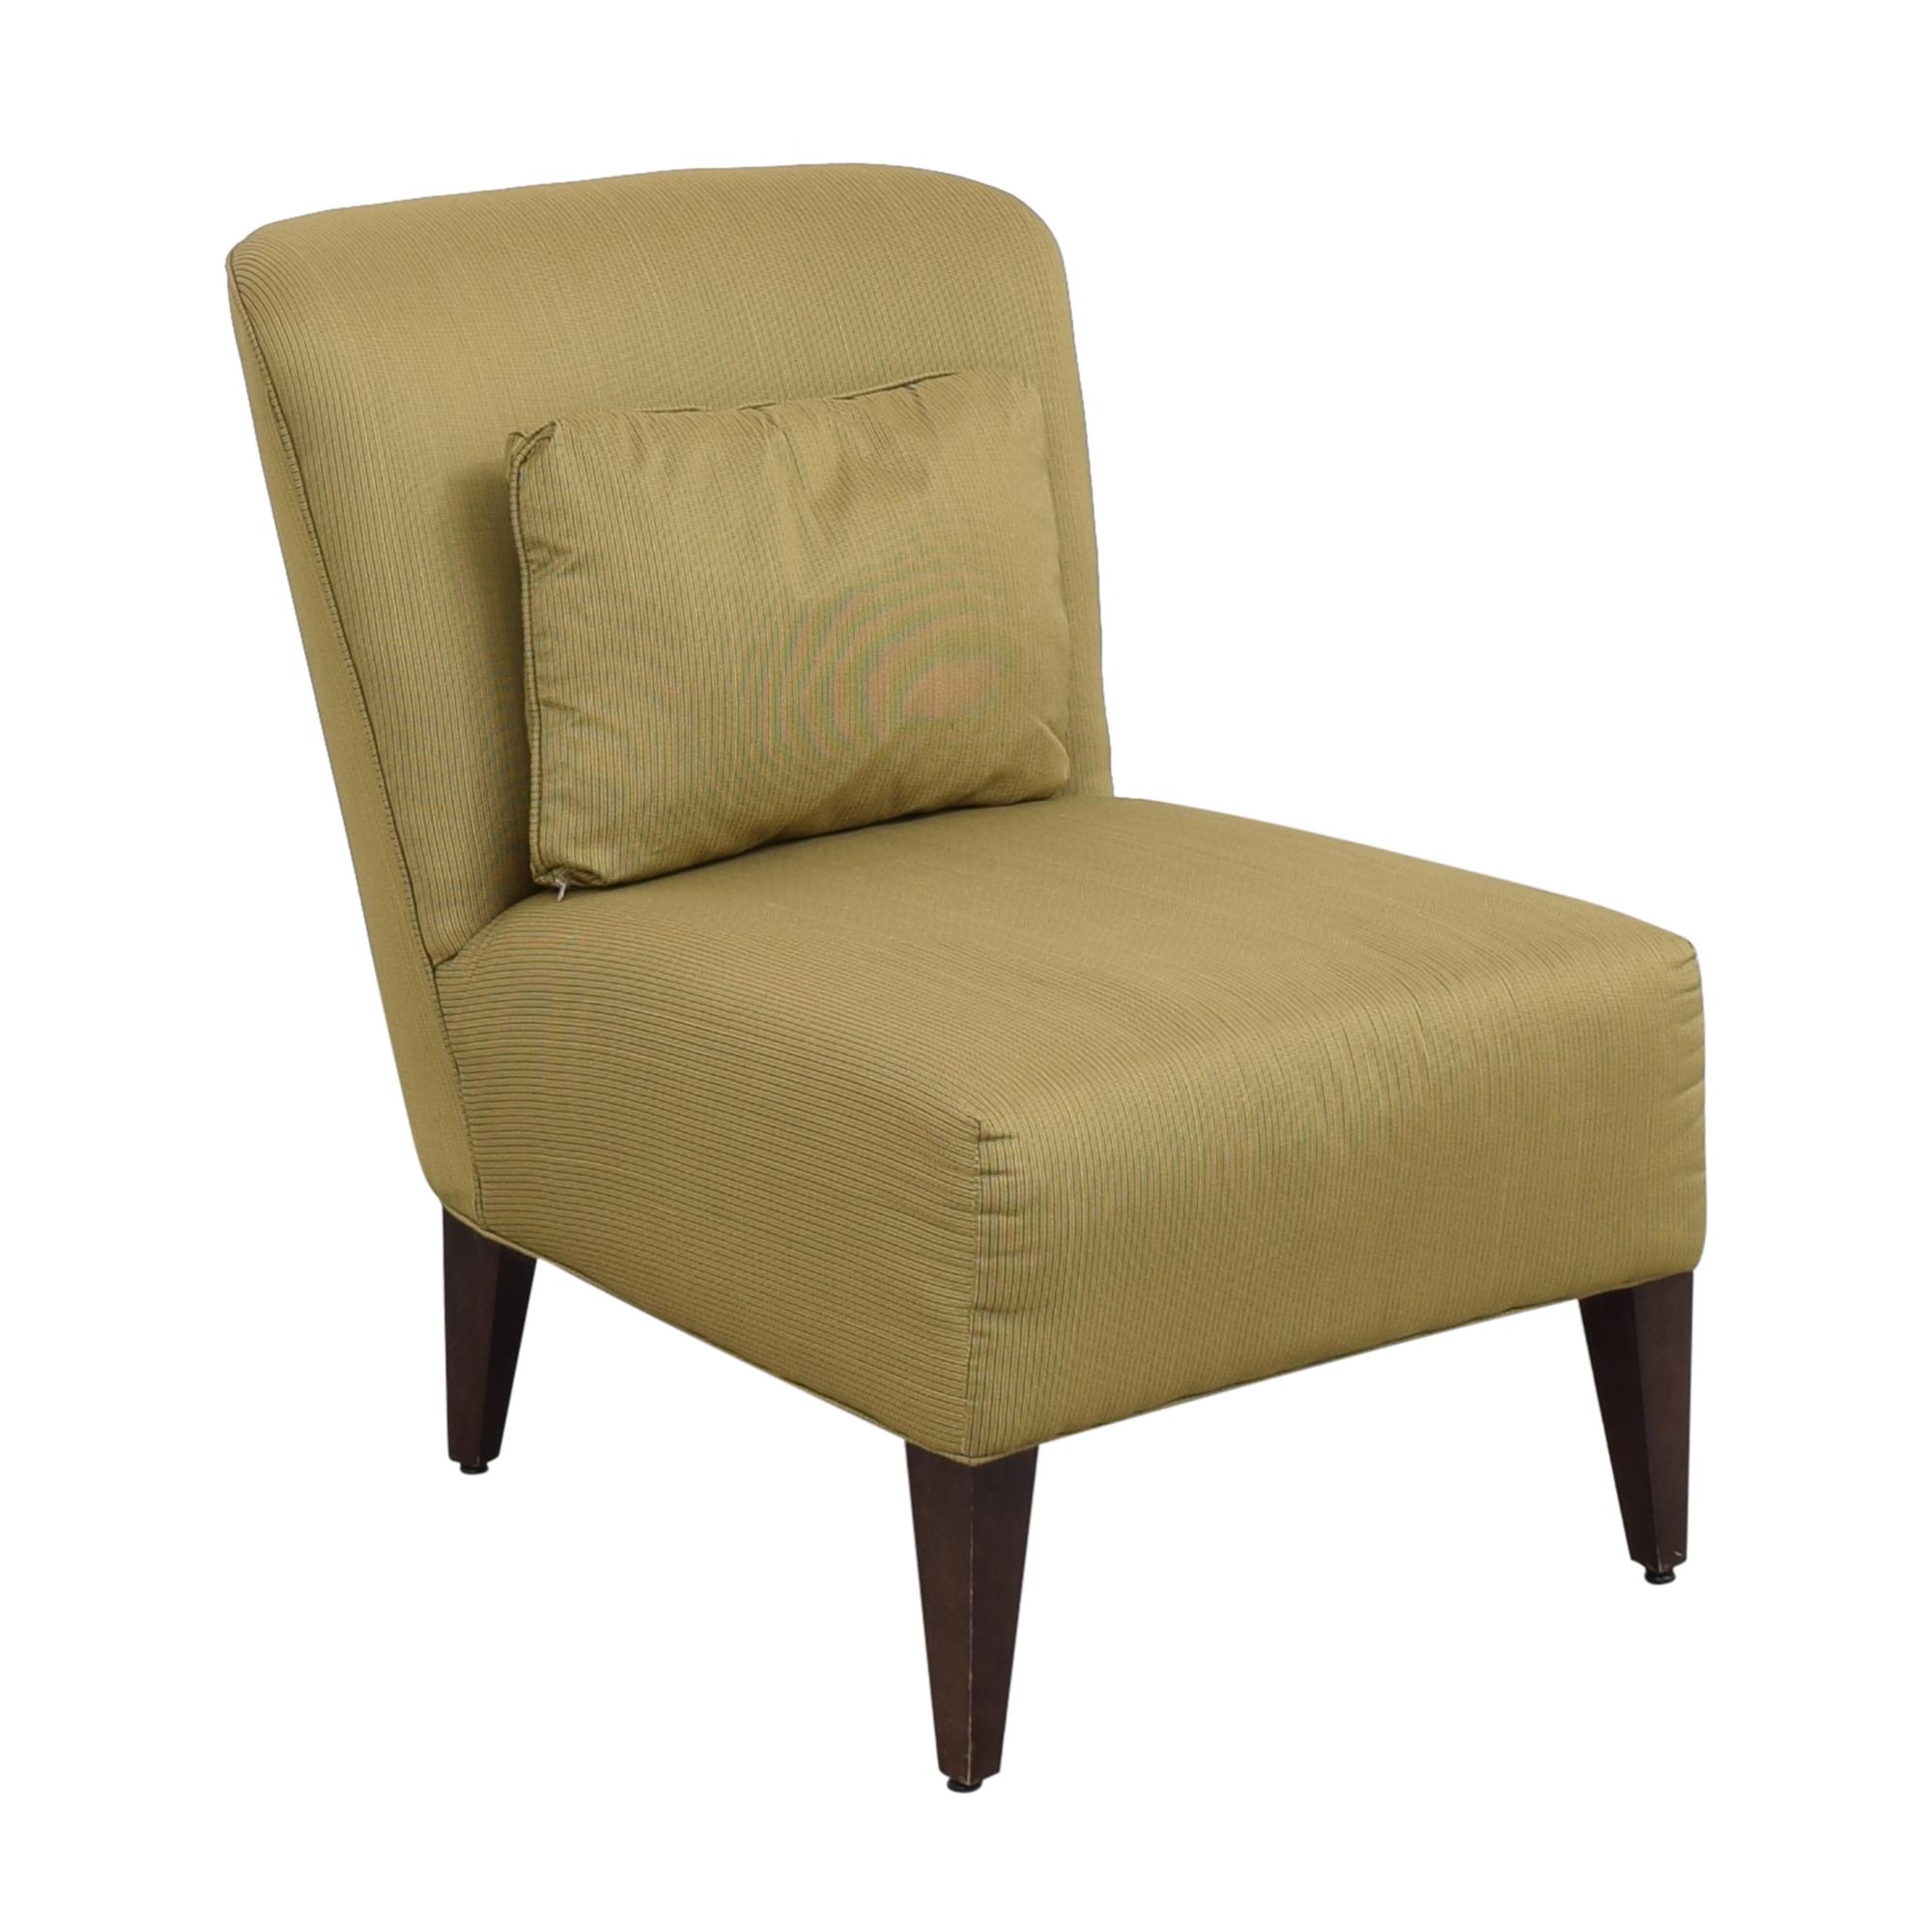 Restoration Hardware Slipper Style Accent Chair Restoration Hardware